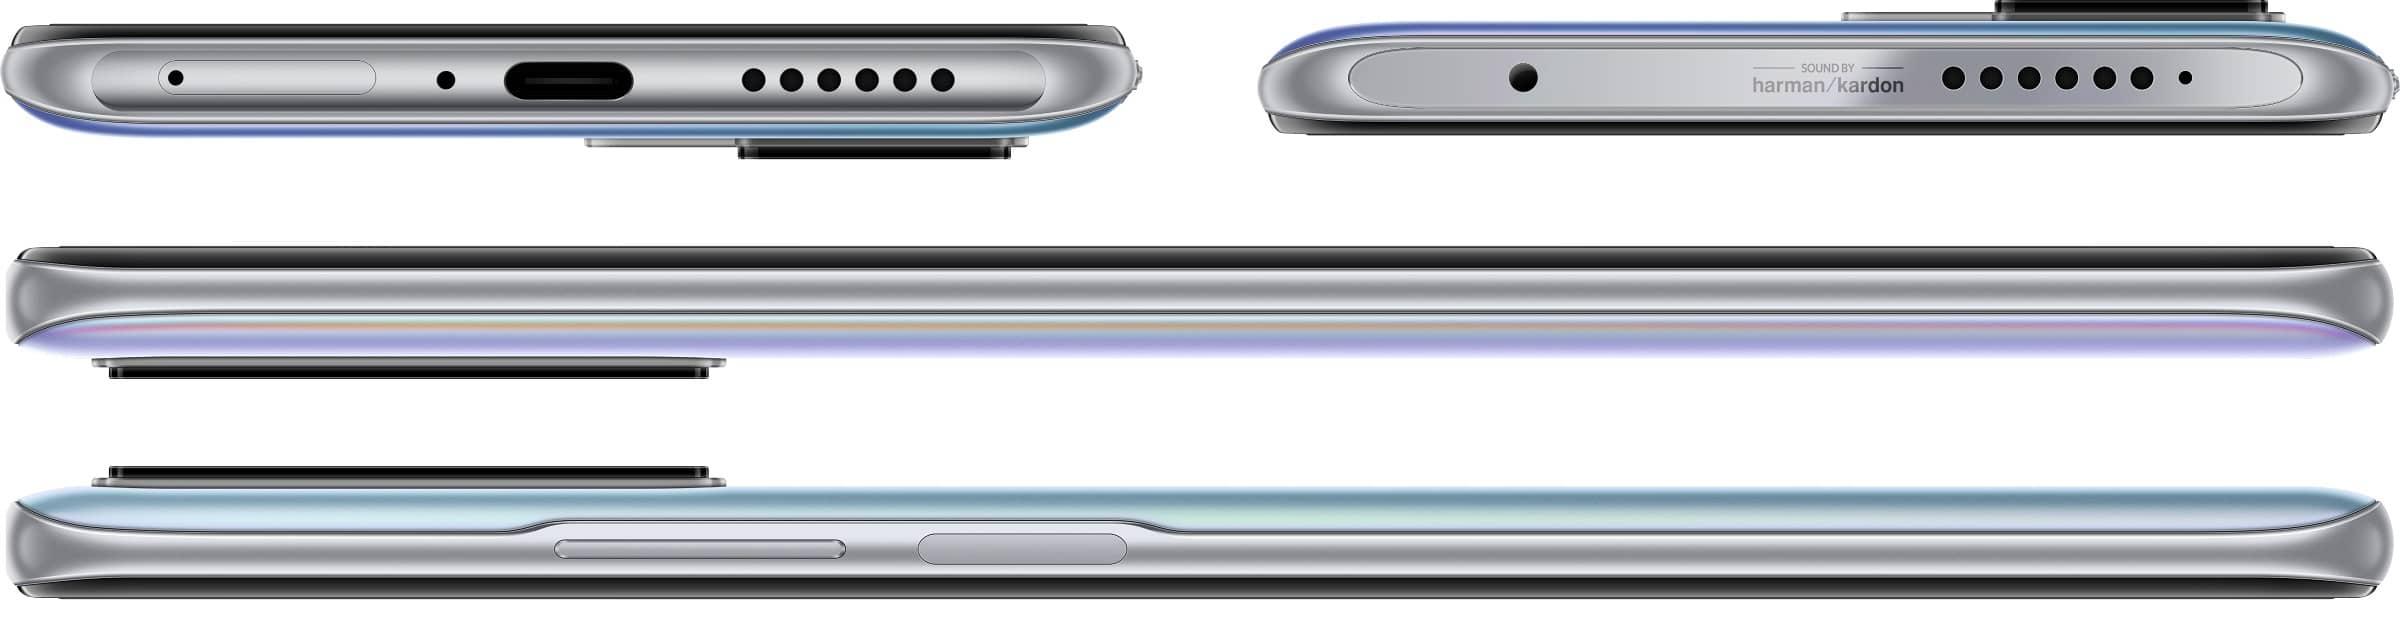 Xiaomi 11T and 11T Pro arrive 4 - شیائومی 11T و 11T پرو با نمایشگر 120 هرتز و دوربین 108 مگاپیکسلی